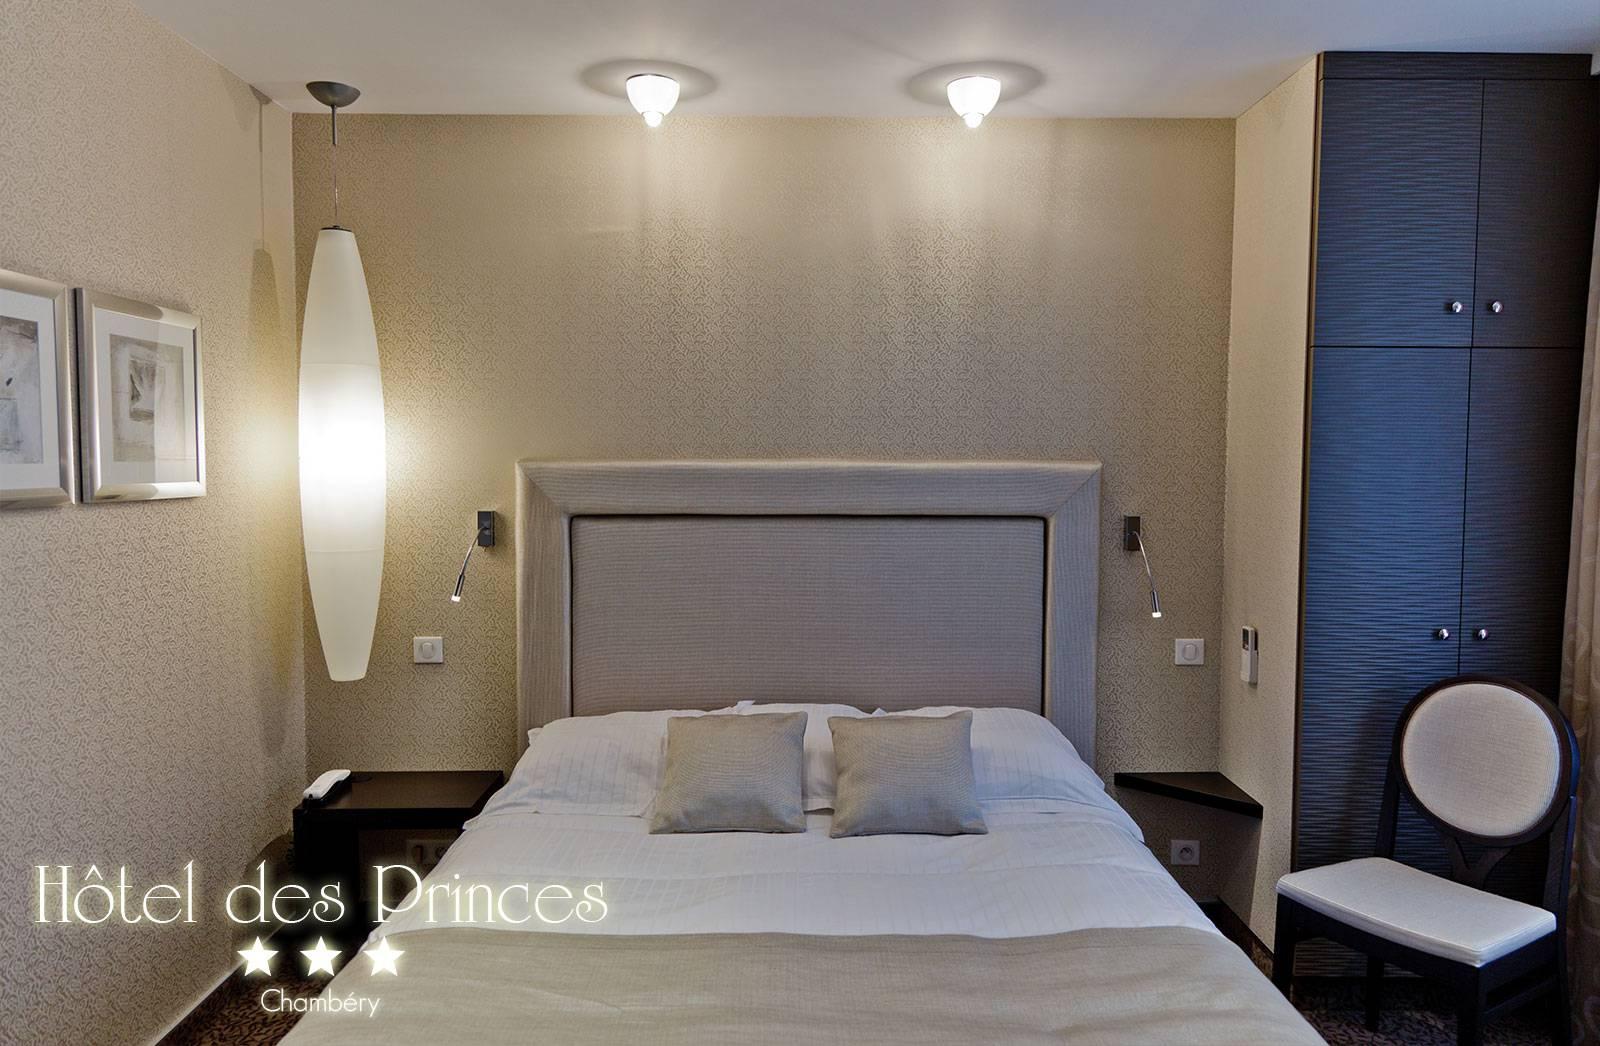 Chambre h tel gare chamb ry el gance h tel des princes - Hotel chambre 4 personnes ...